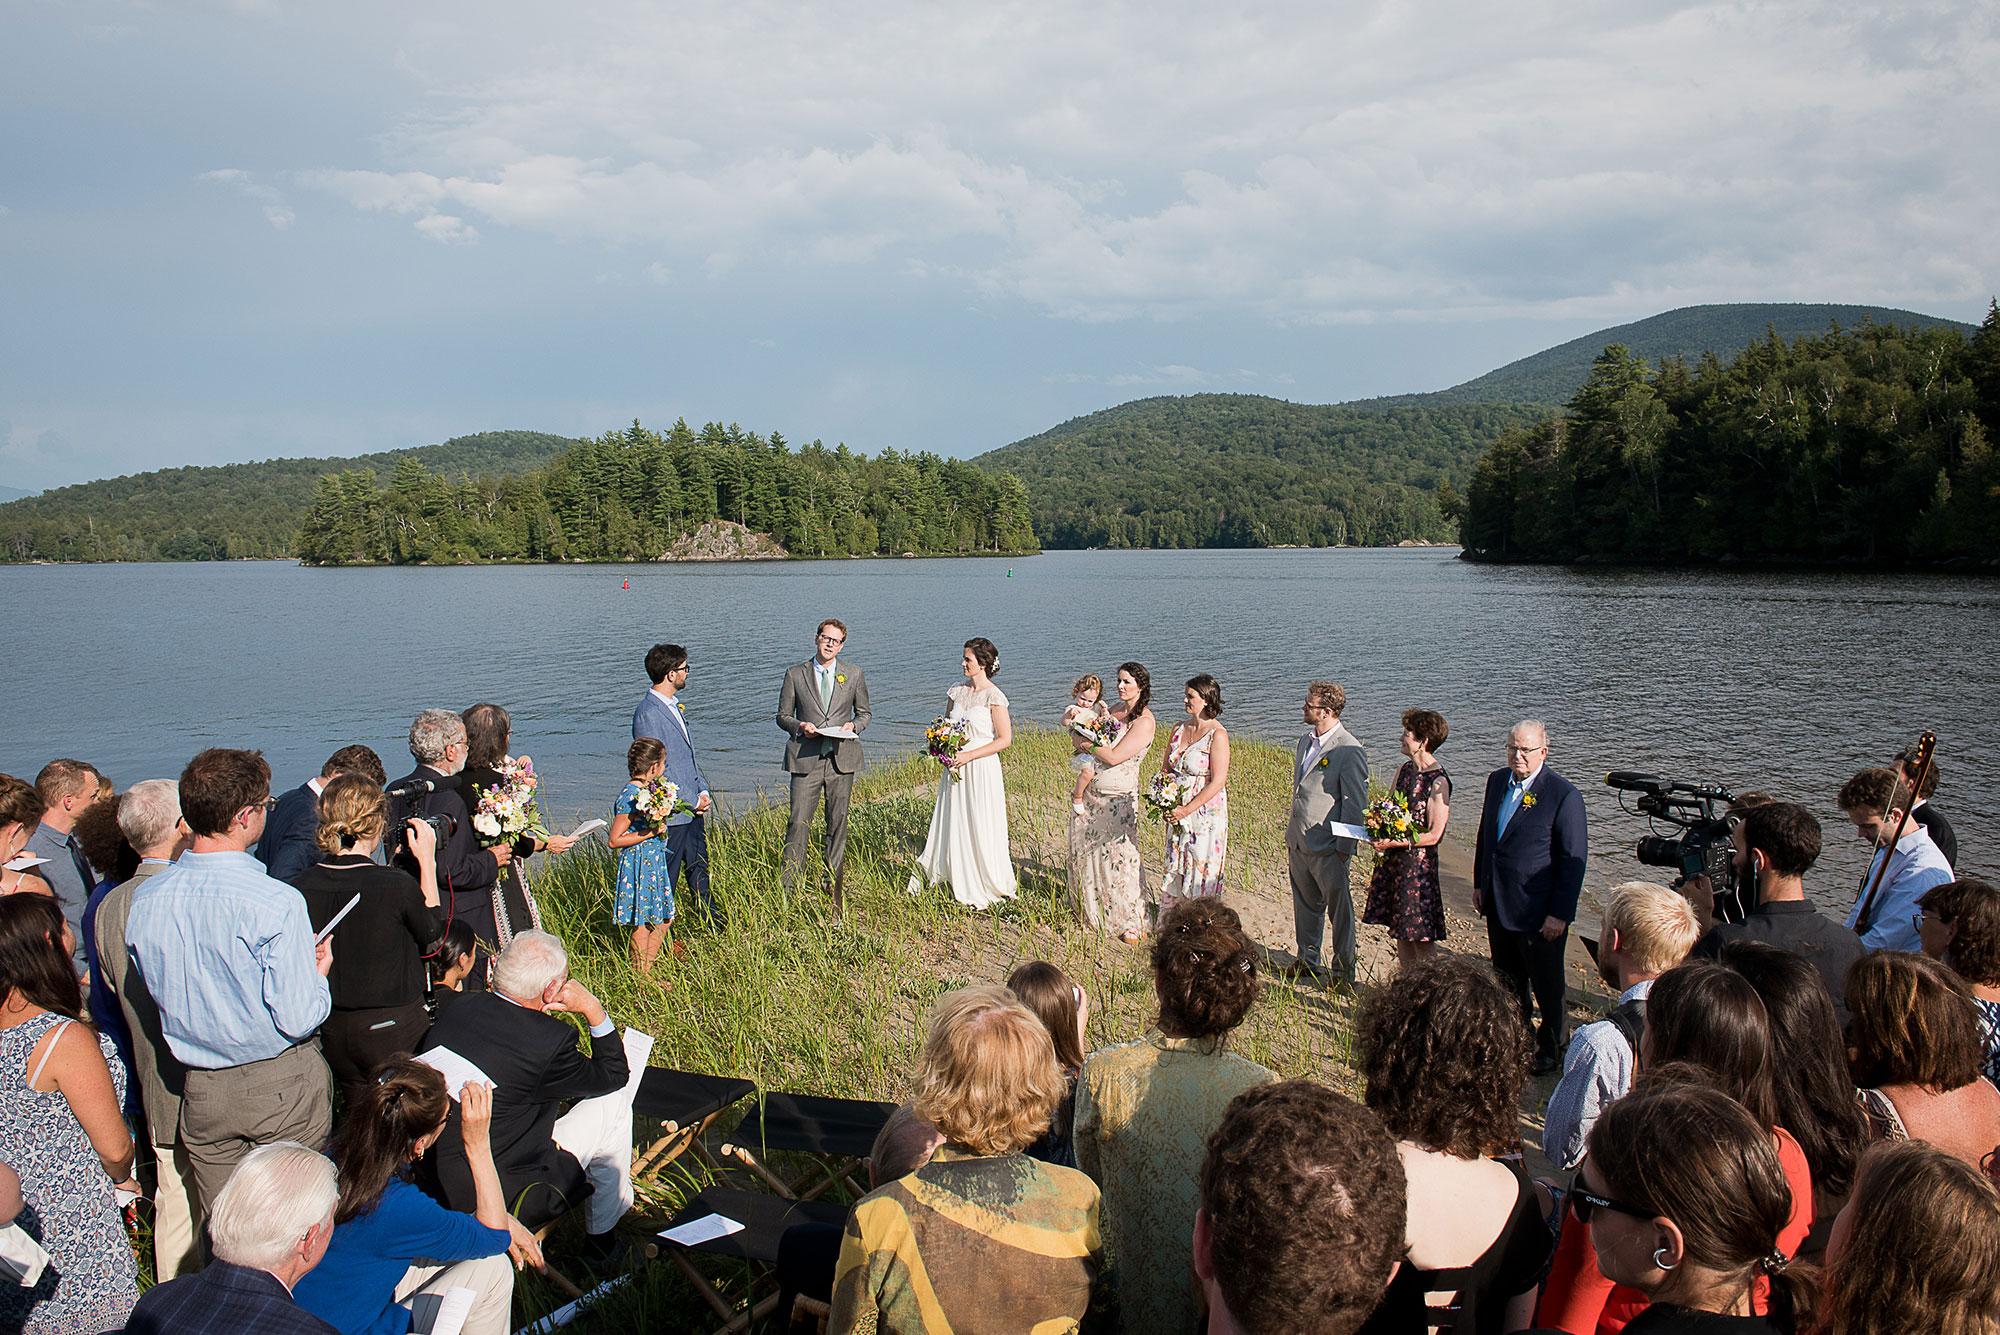 adirondack_wedding_lakeside_point_mary_justi.jpg